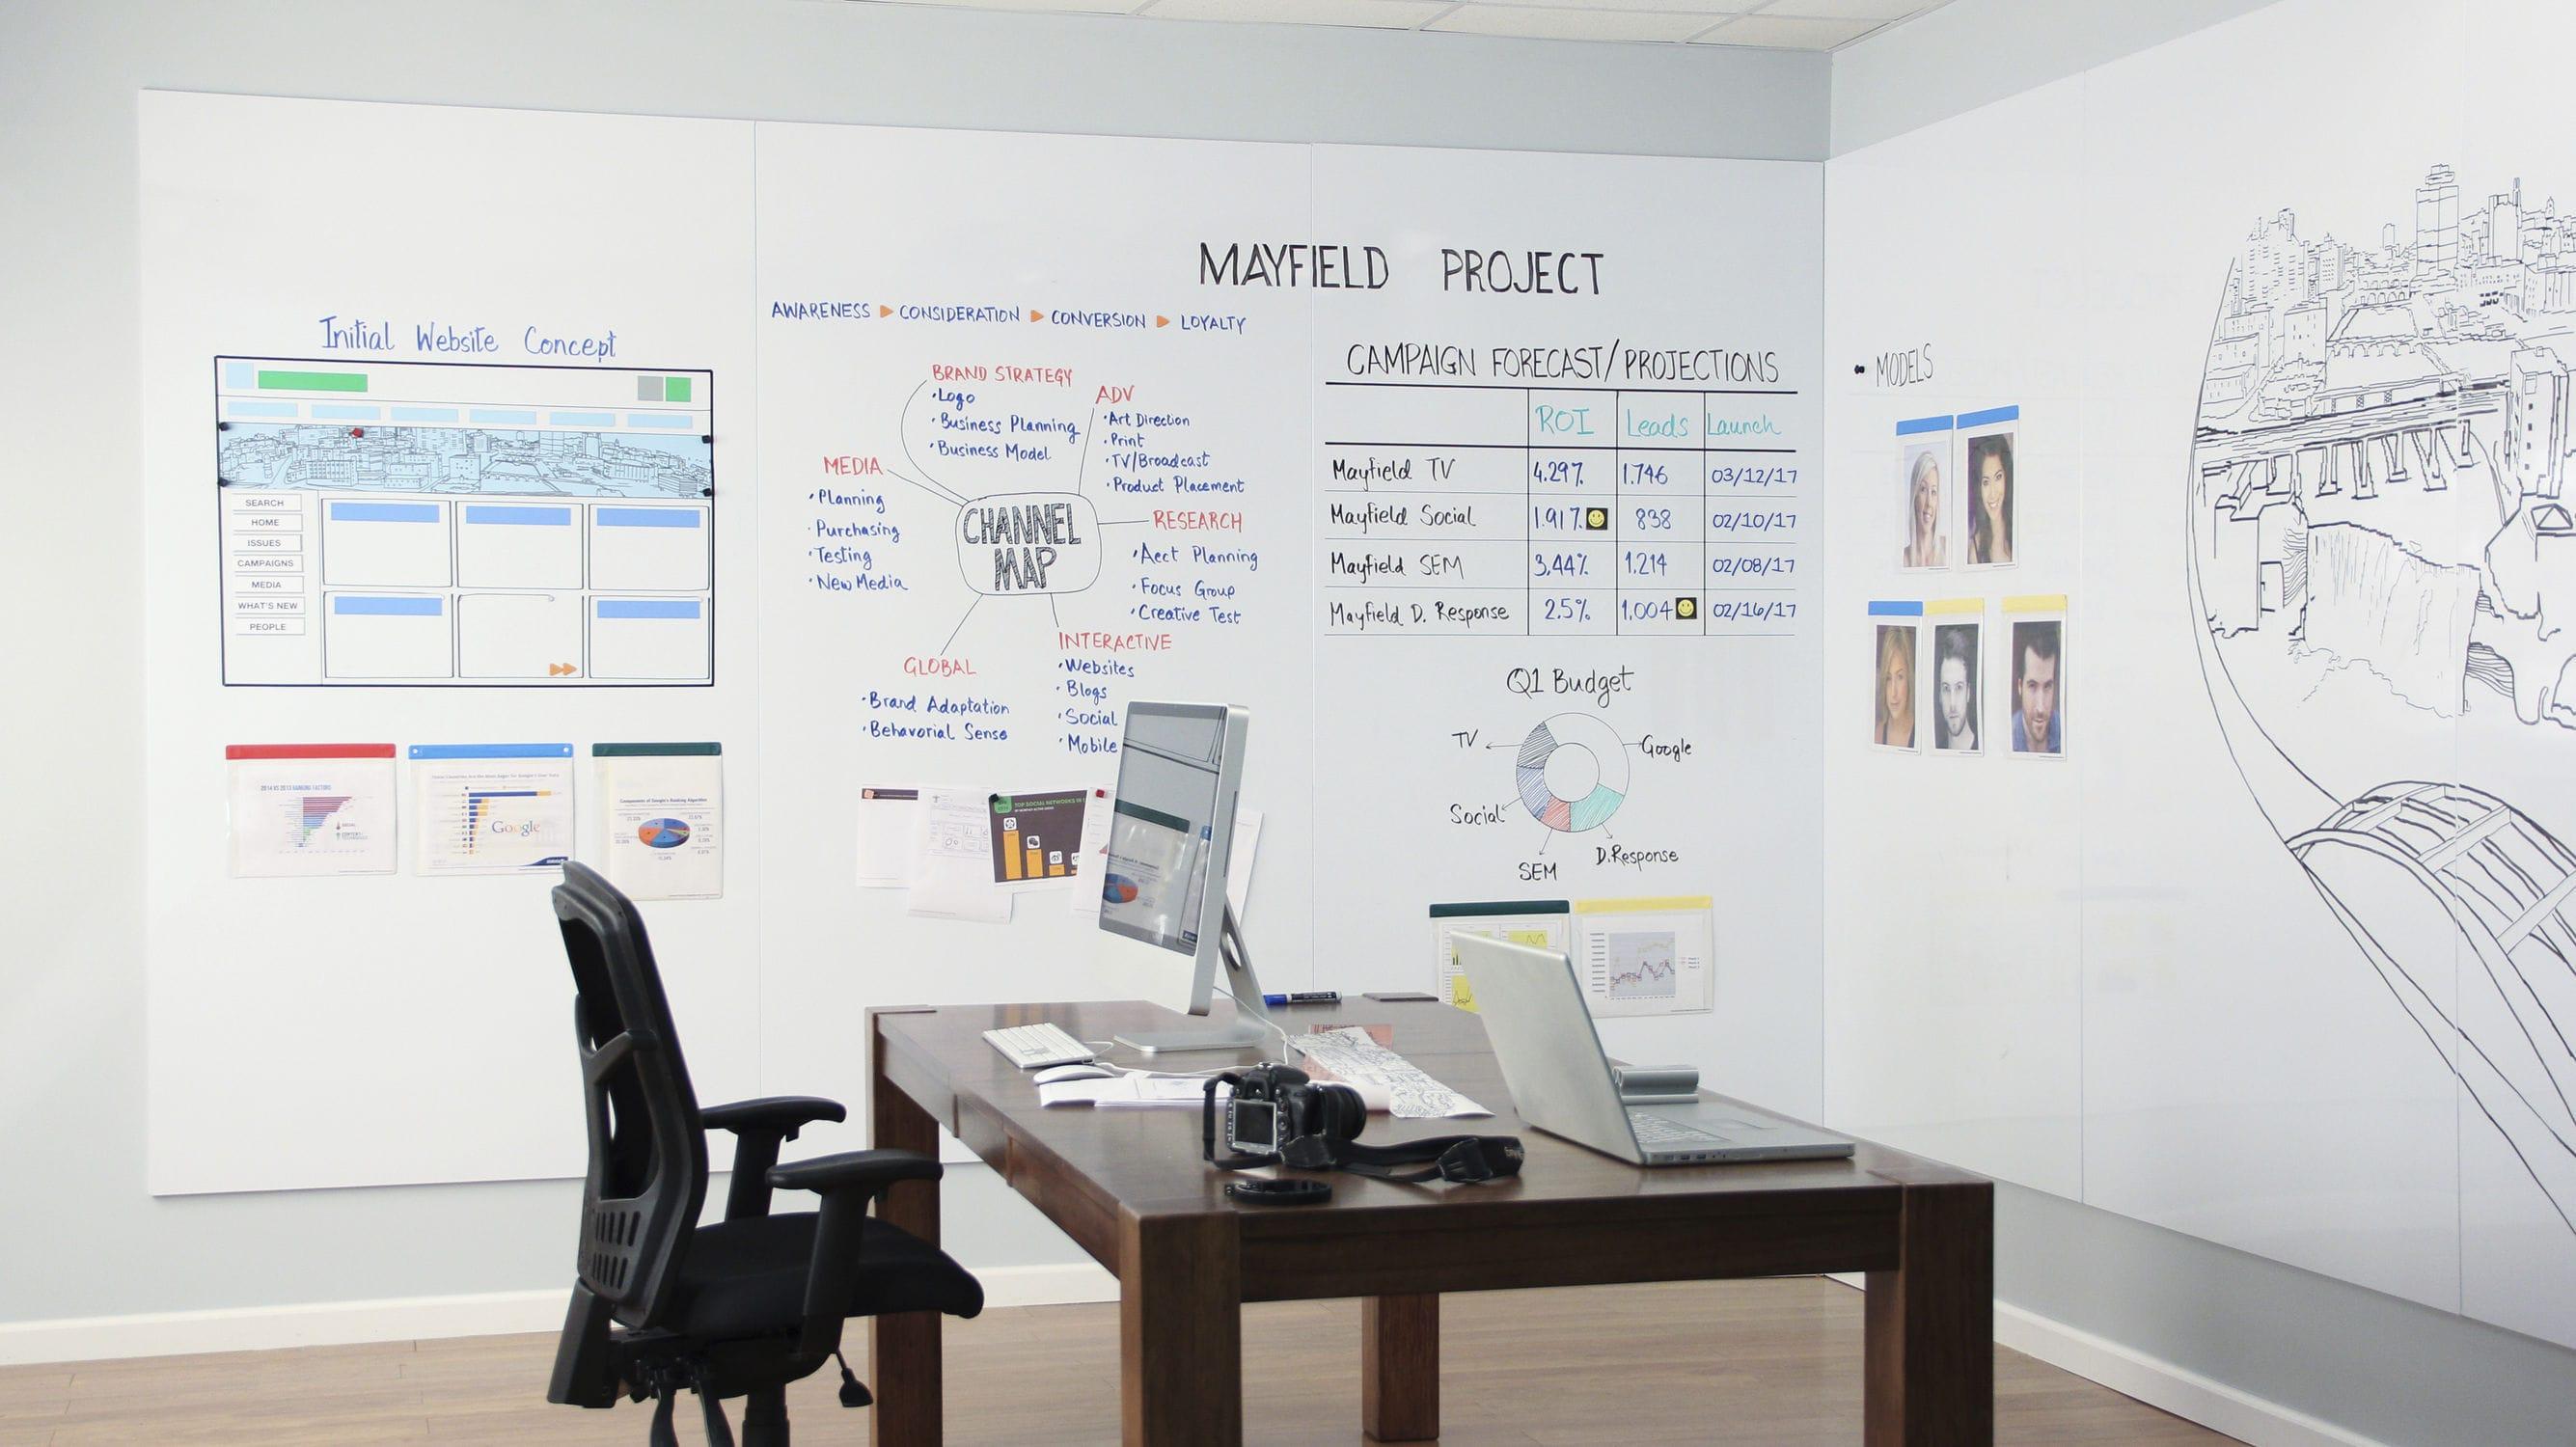 magnetic board erasable wallmounted largeformat whiteboard panels